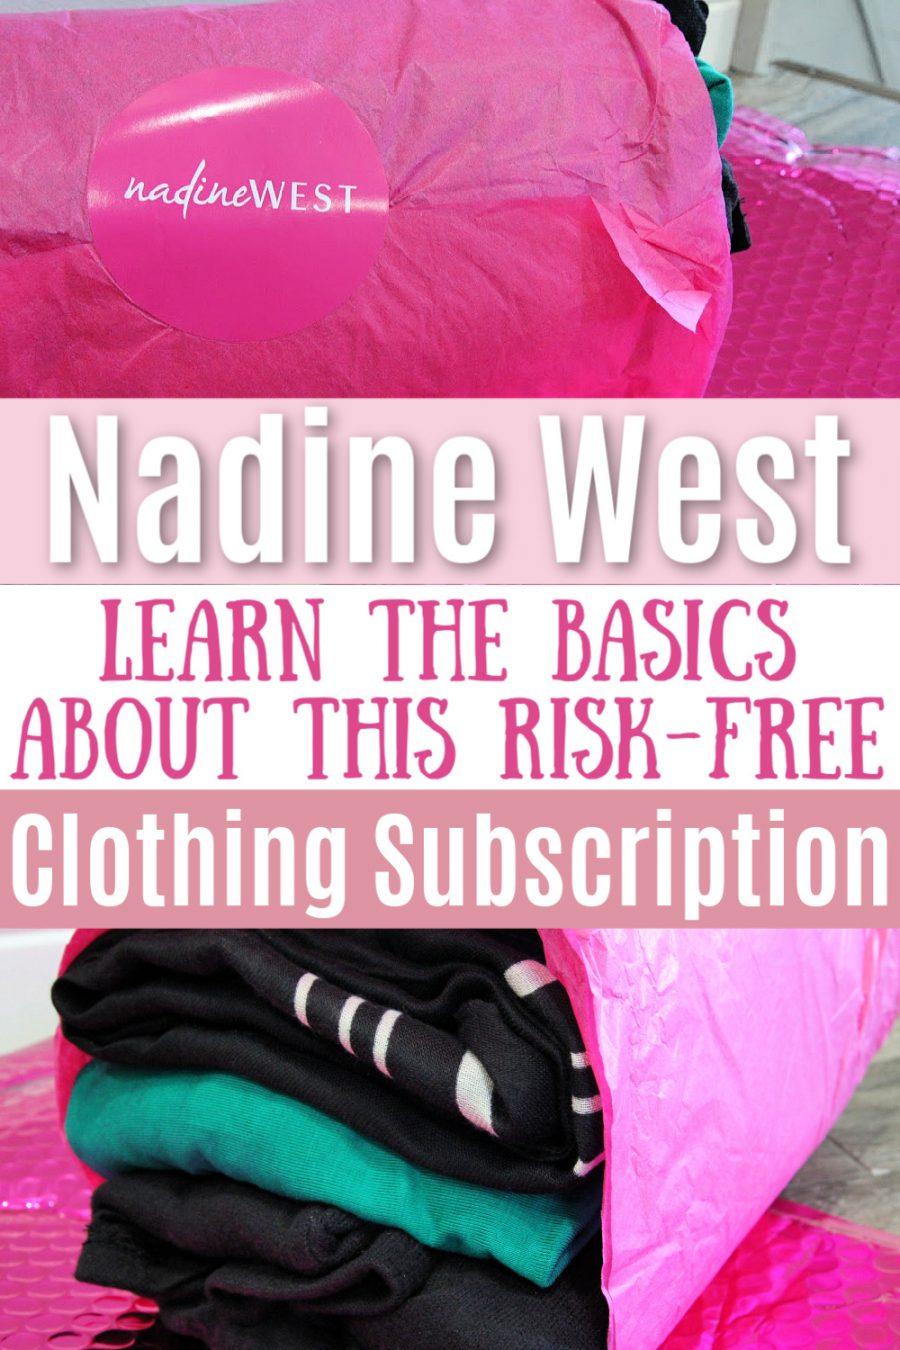 Nadine West Basics - A Risk Free Clothing Subscription